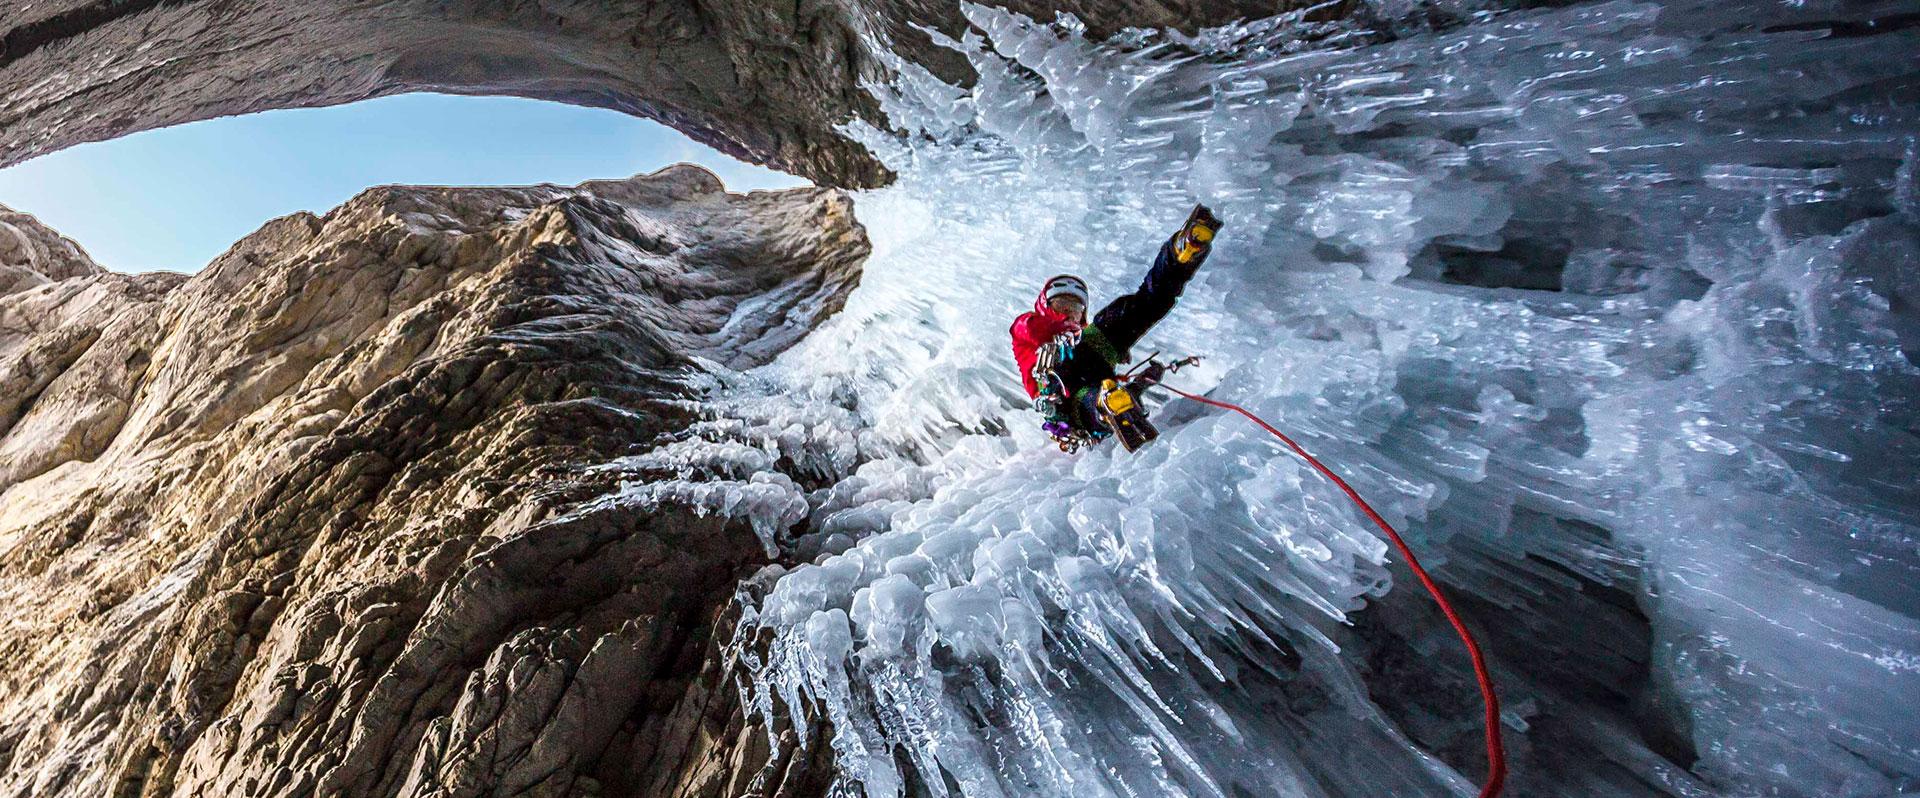 Winter weekend thrills in Banff | Vacay.ca